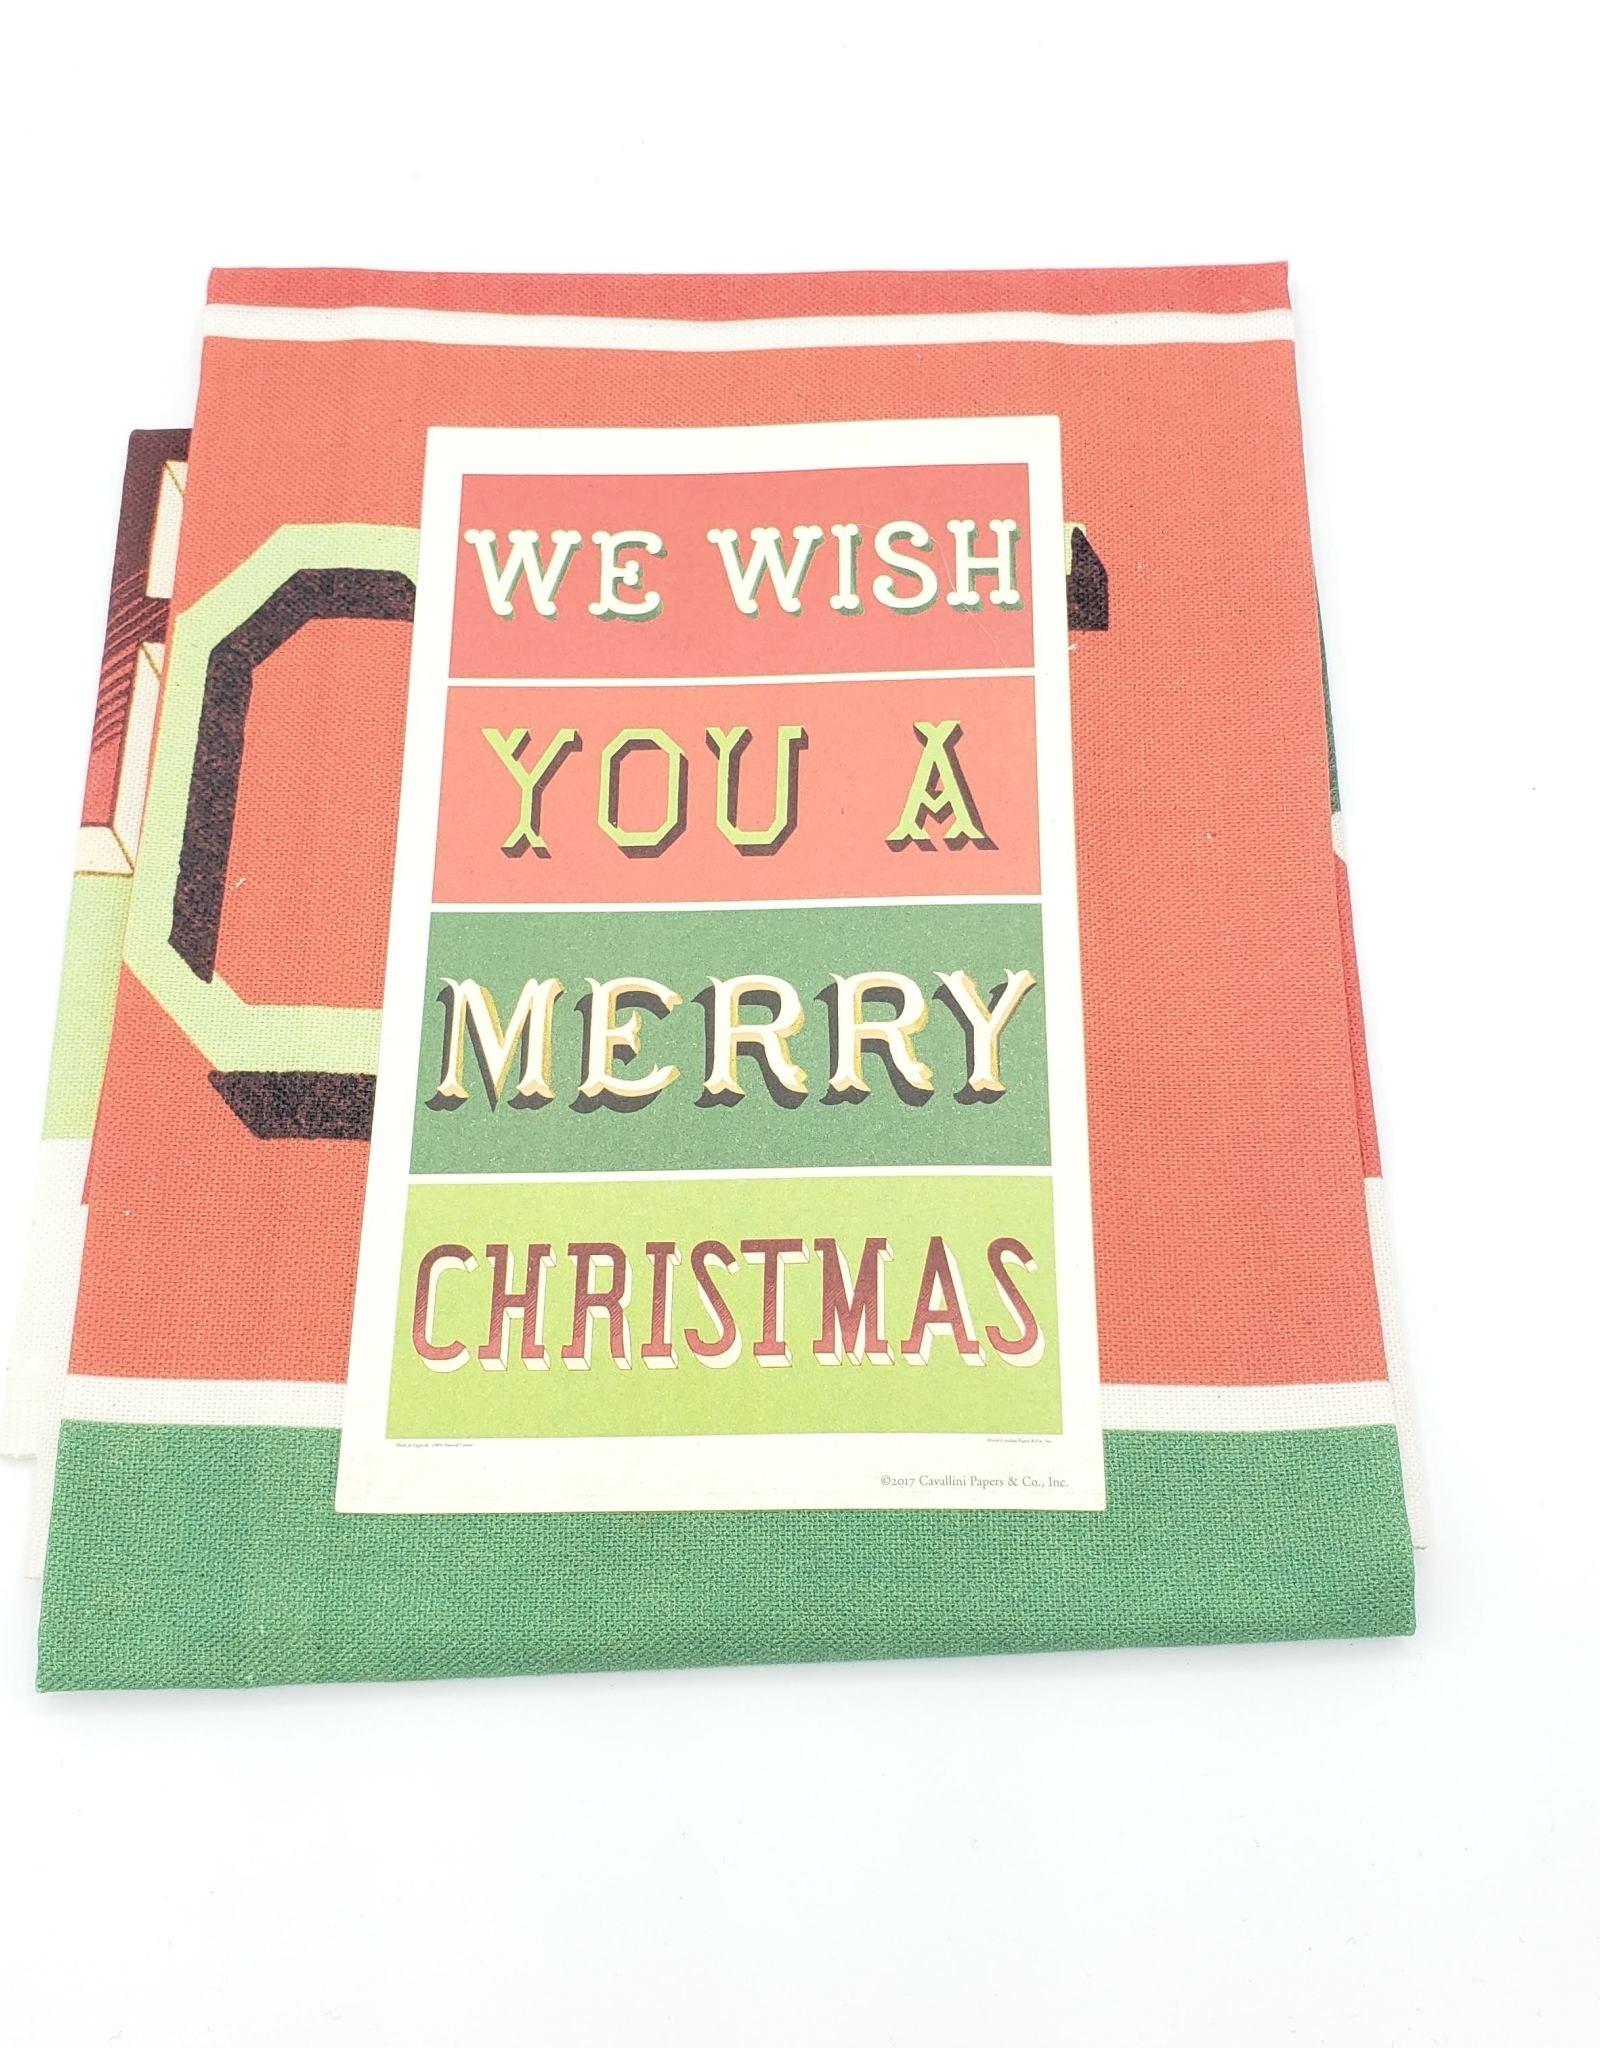 Cavallini Papers Merry Christmas Tea Towel by Cavallini